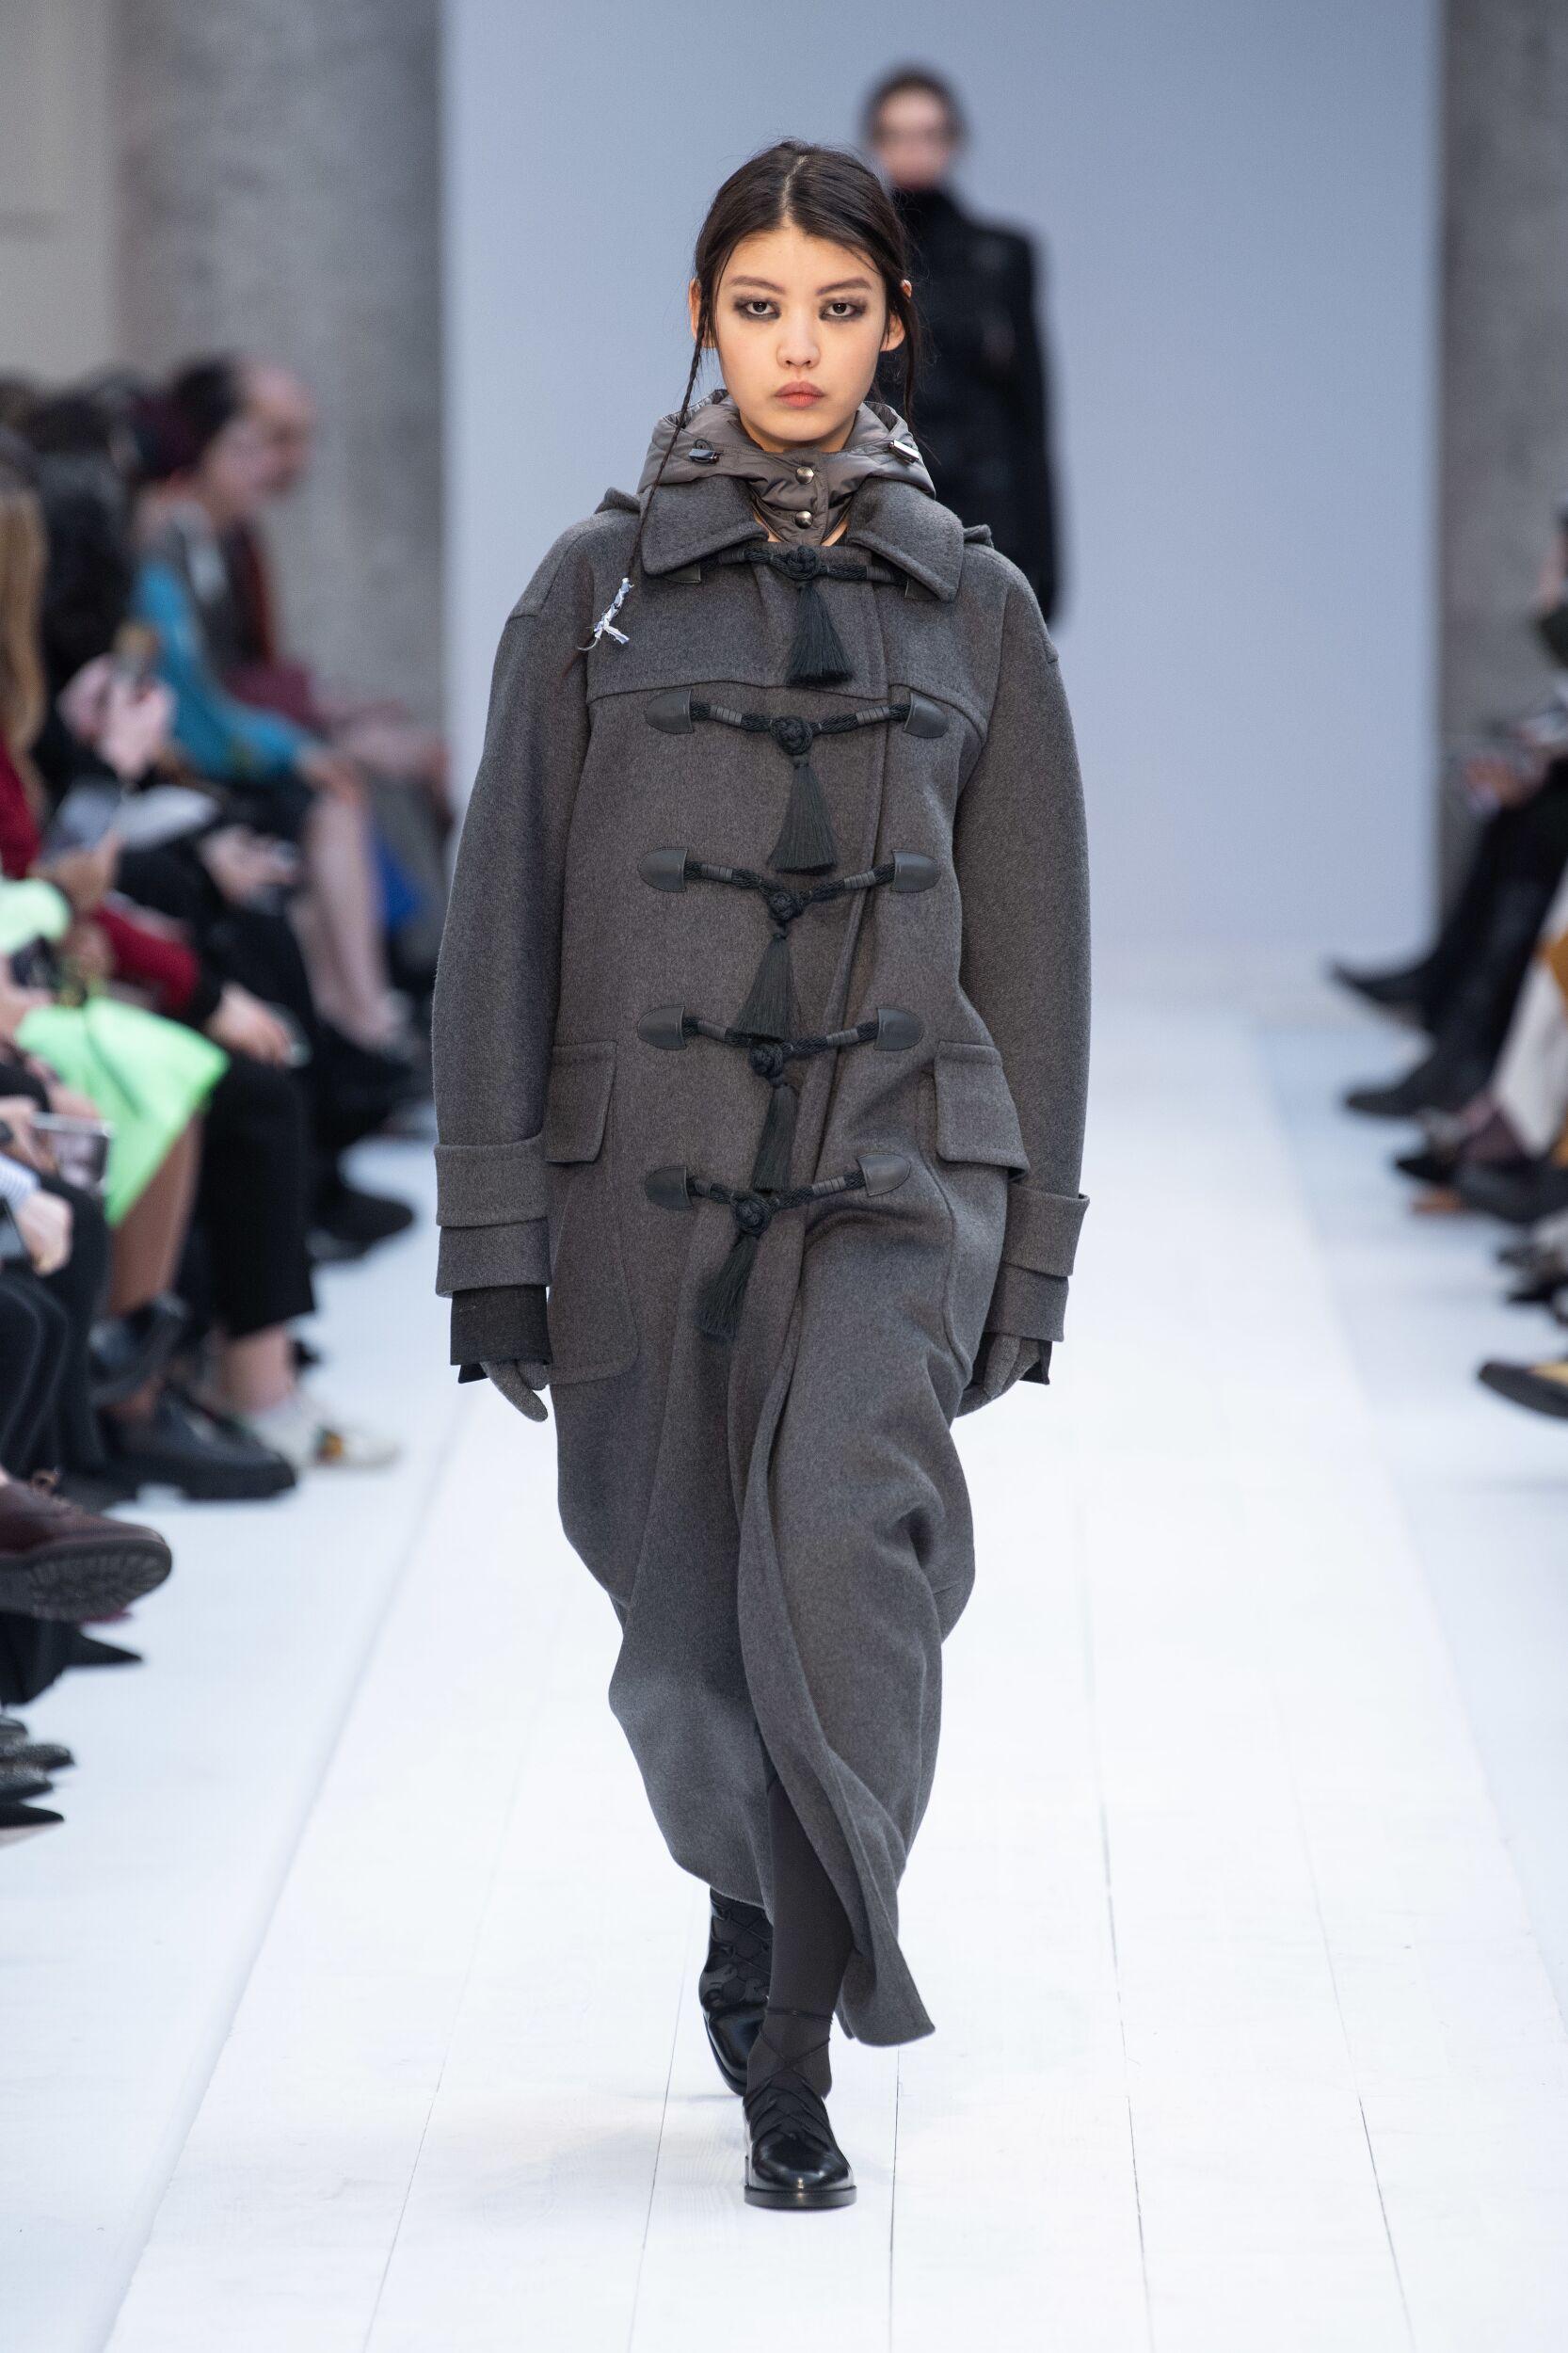 Max Mara FW 2020 Womenswear